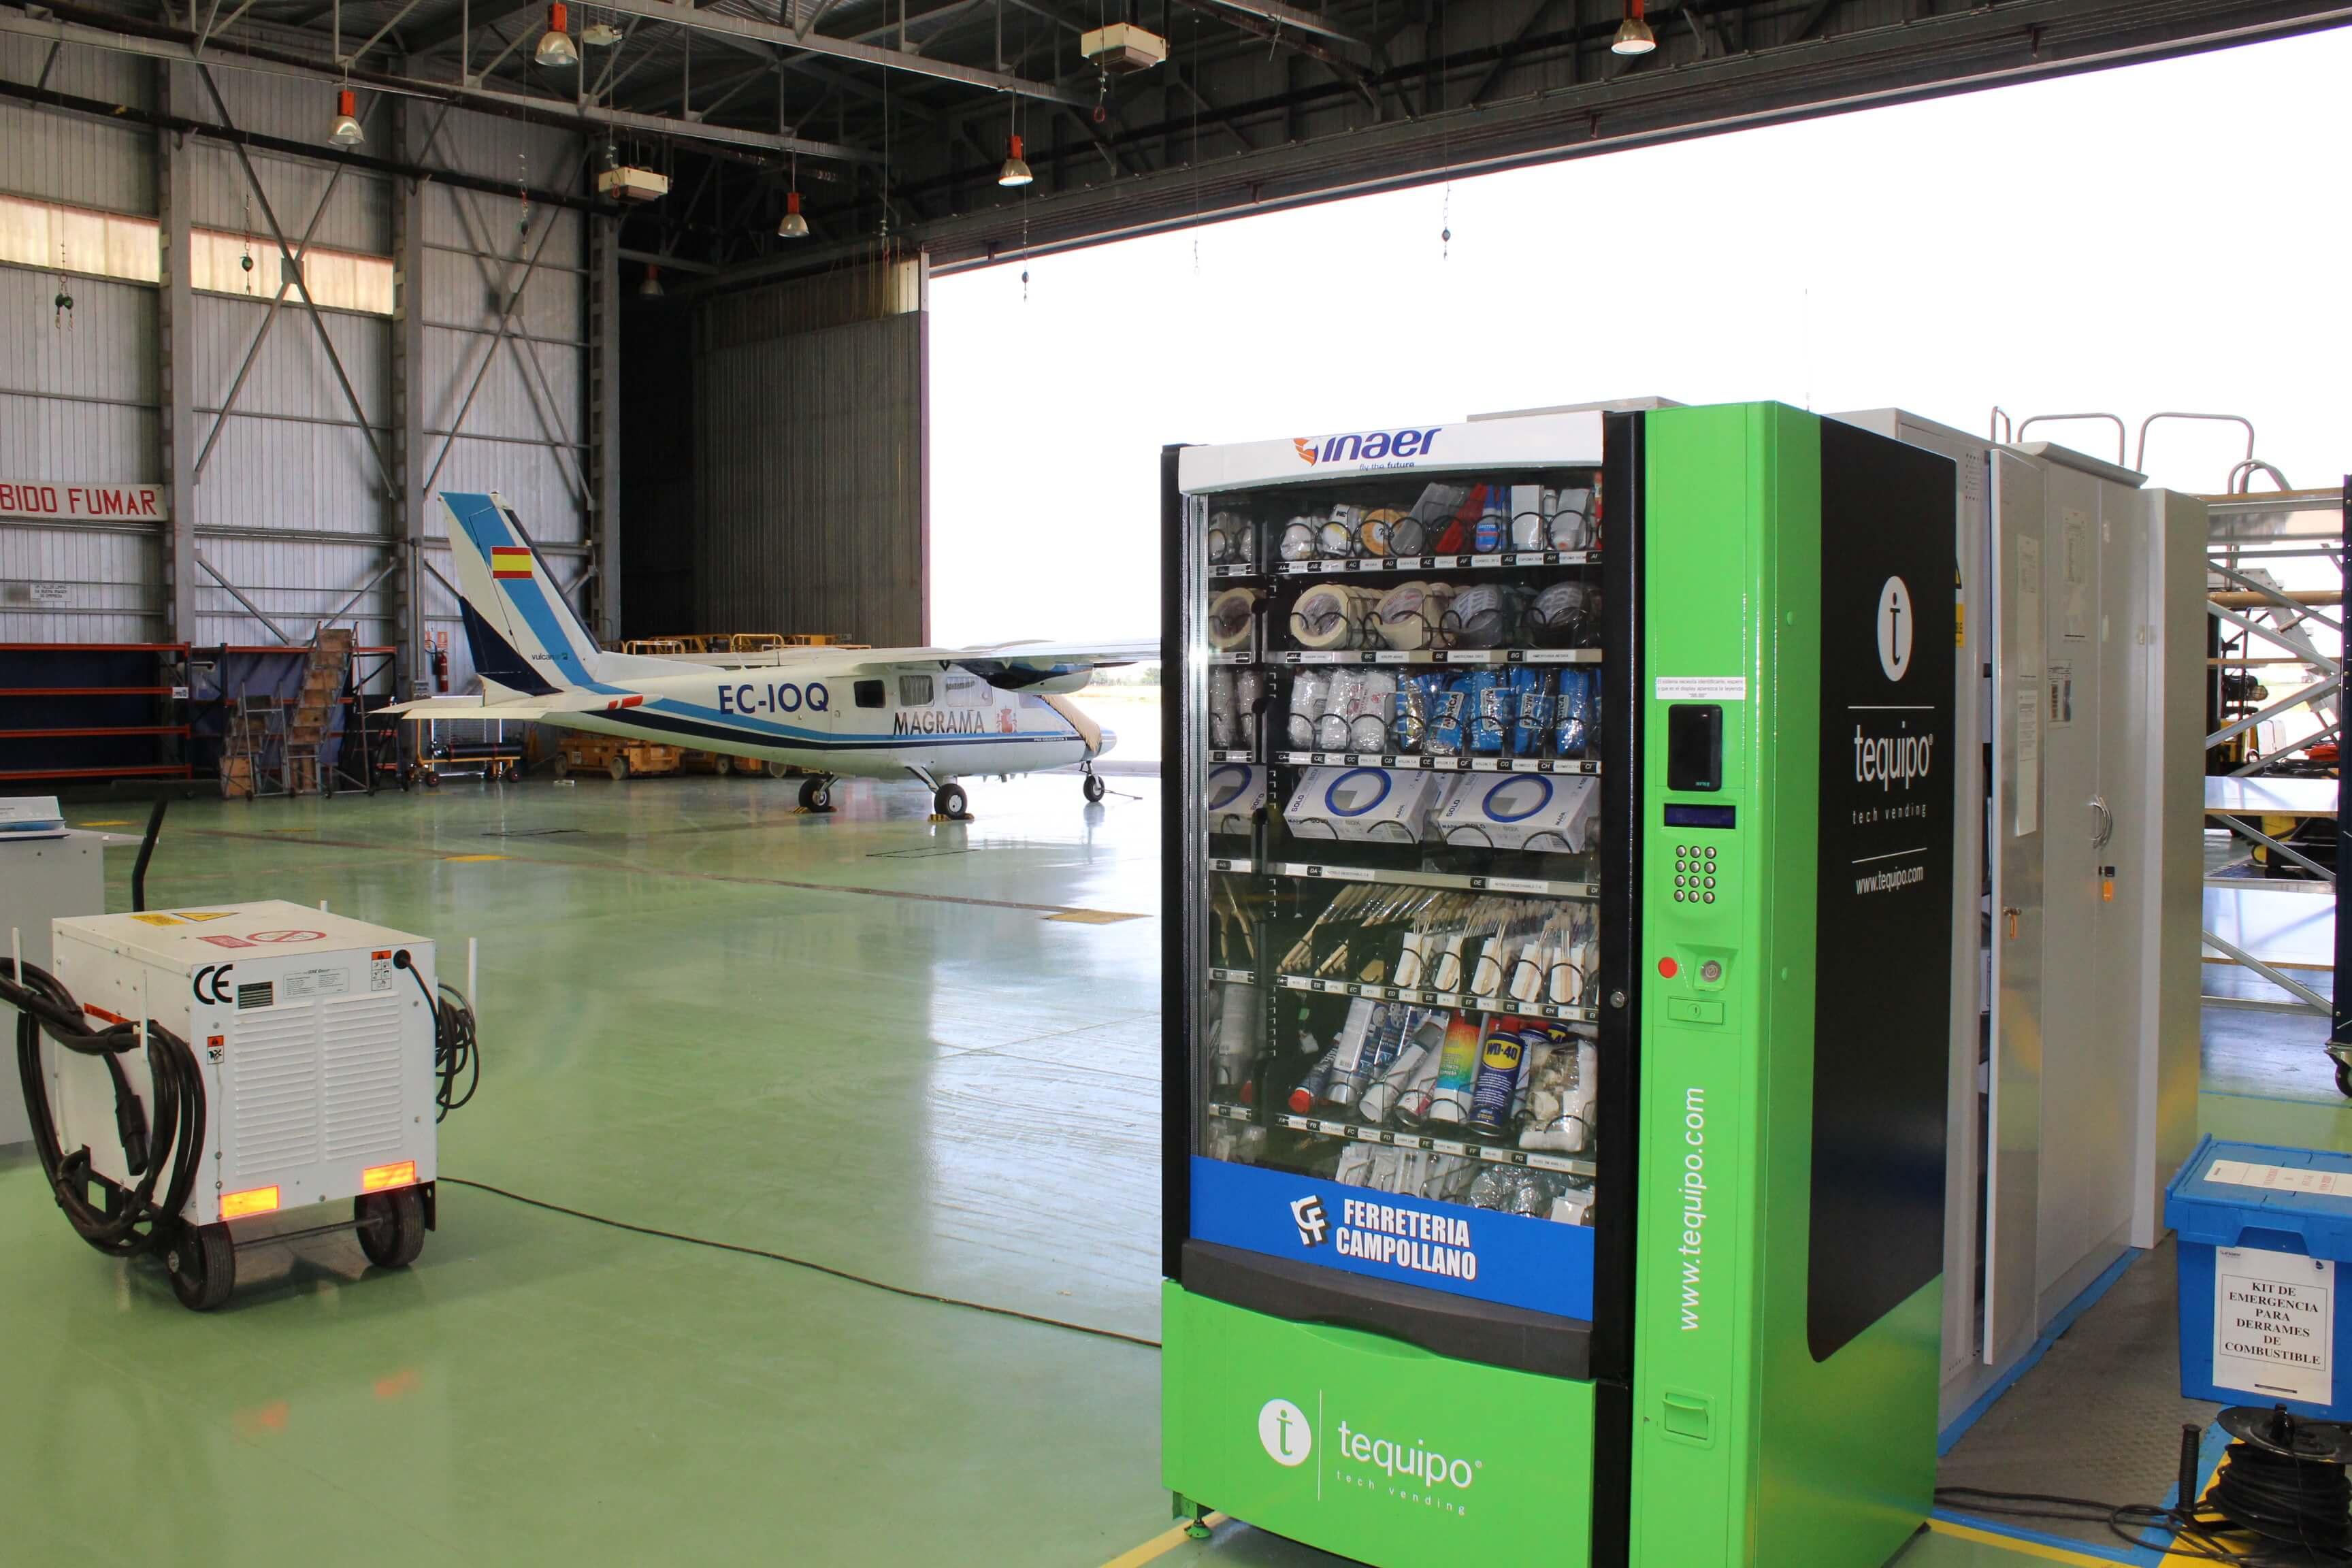 Máquina expendedora aeropuerto